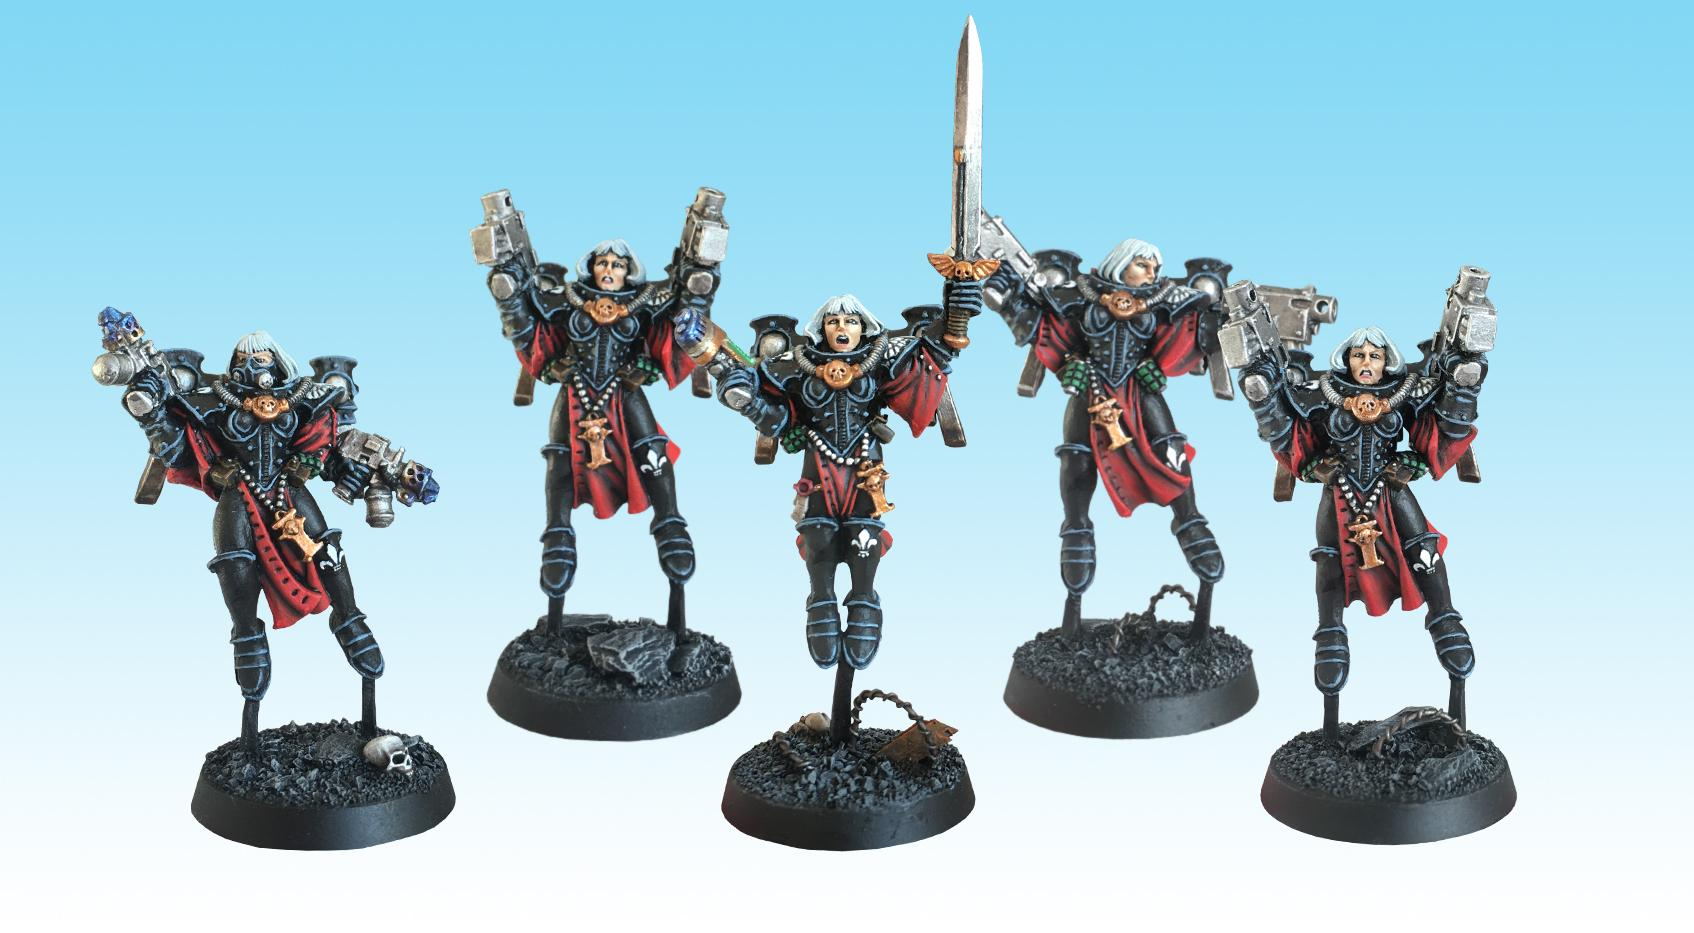 Adepta Sororitas, Old Hammer, Order Of Our Martyred Lady, Painted, Seraphim, Sisters Of Battle, Squad, Warhammer 40,000